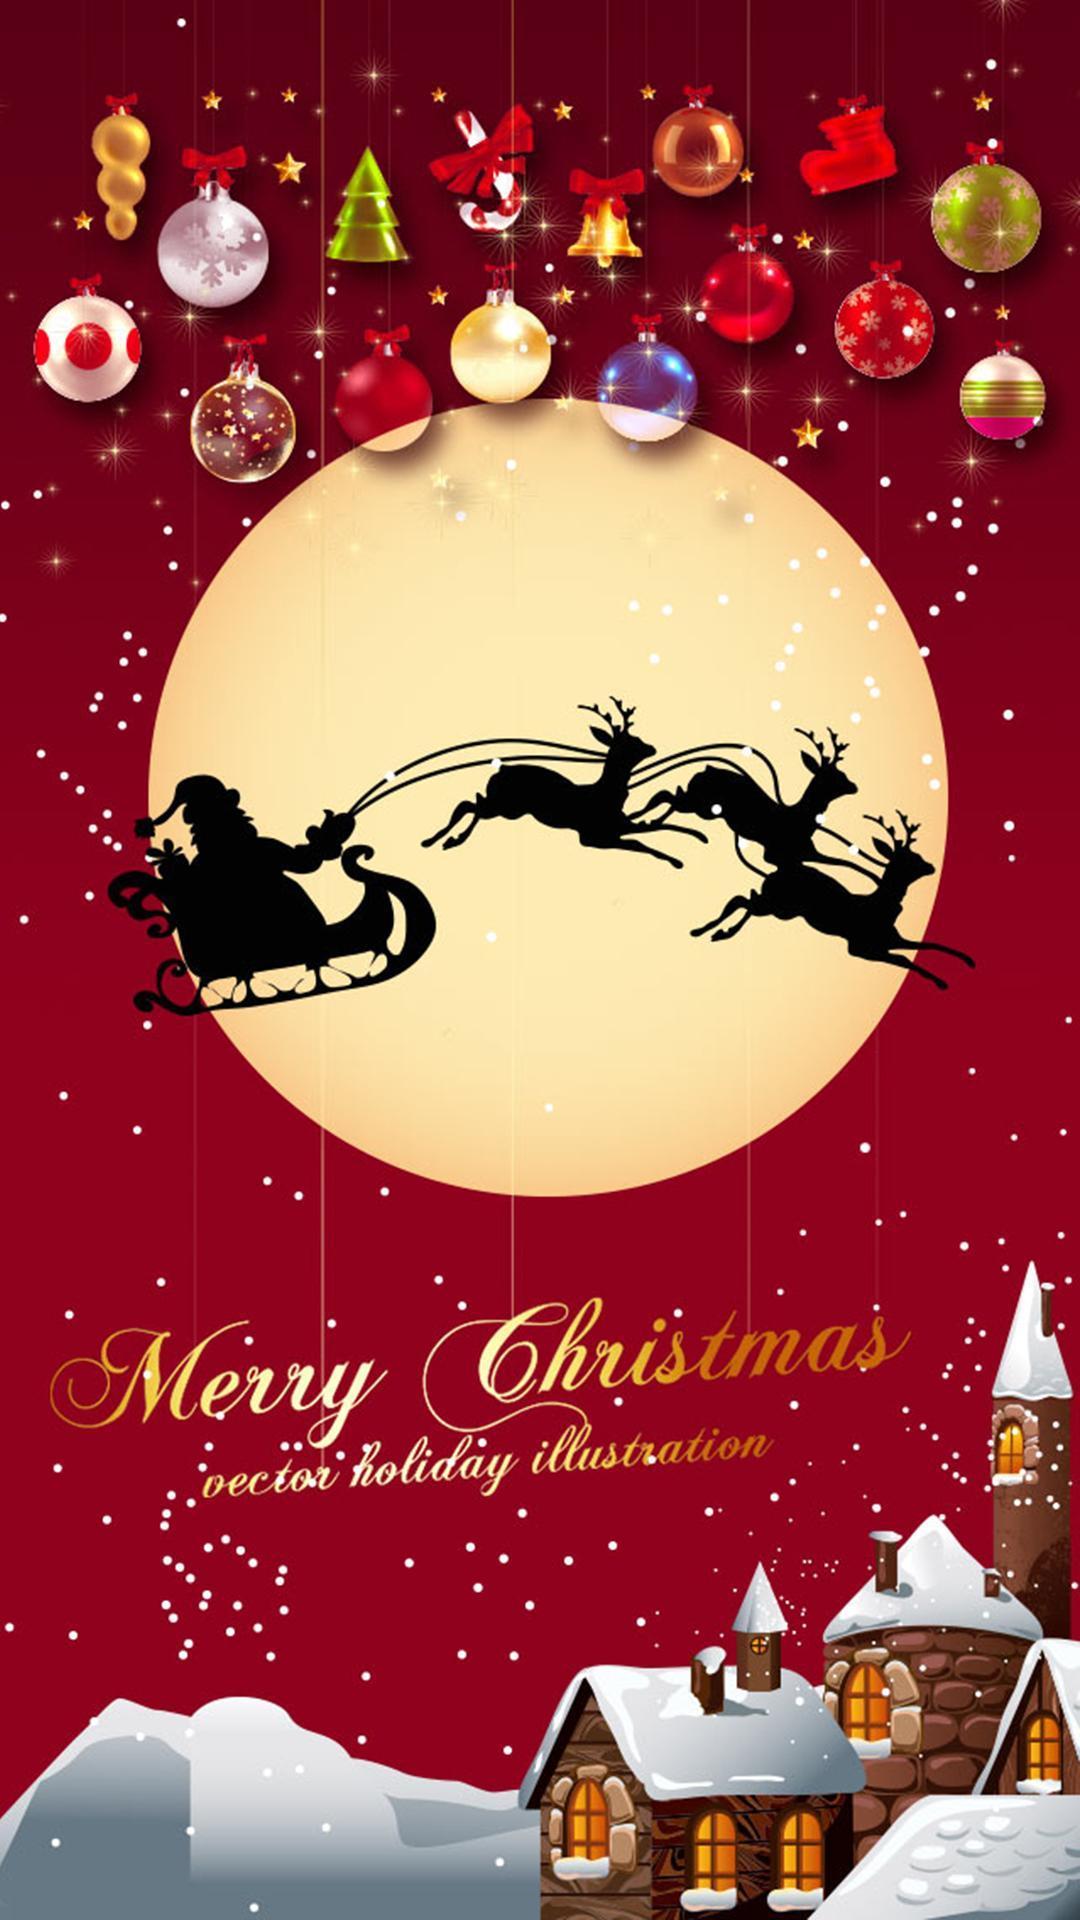 34 2020 Christmas Pictures Wallpapers On Wallpapersafari